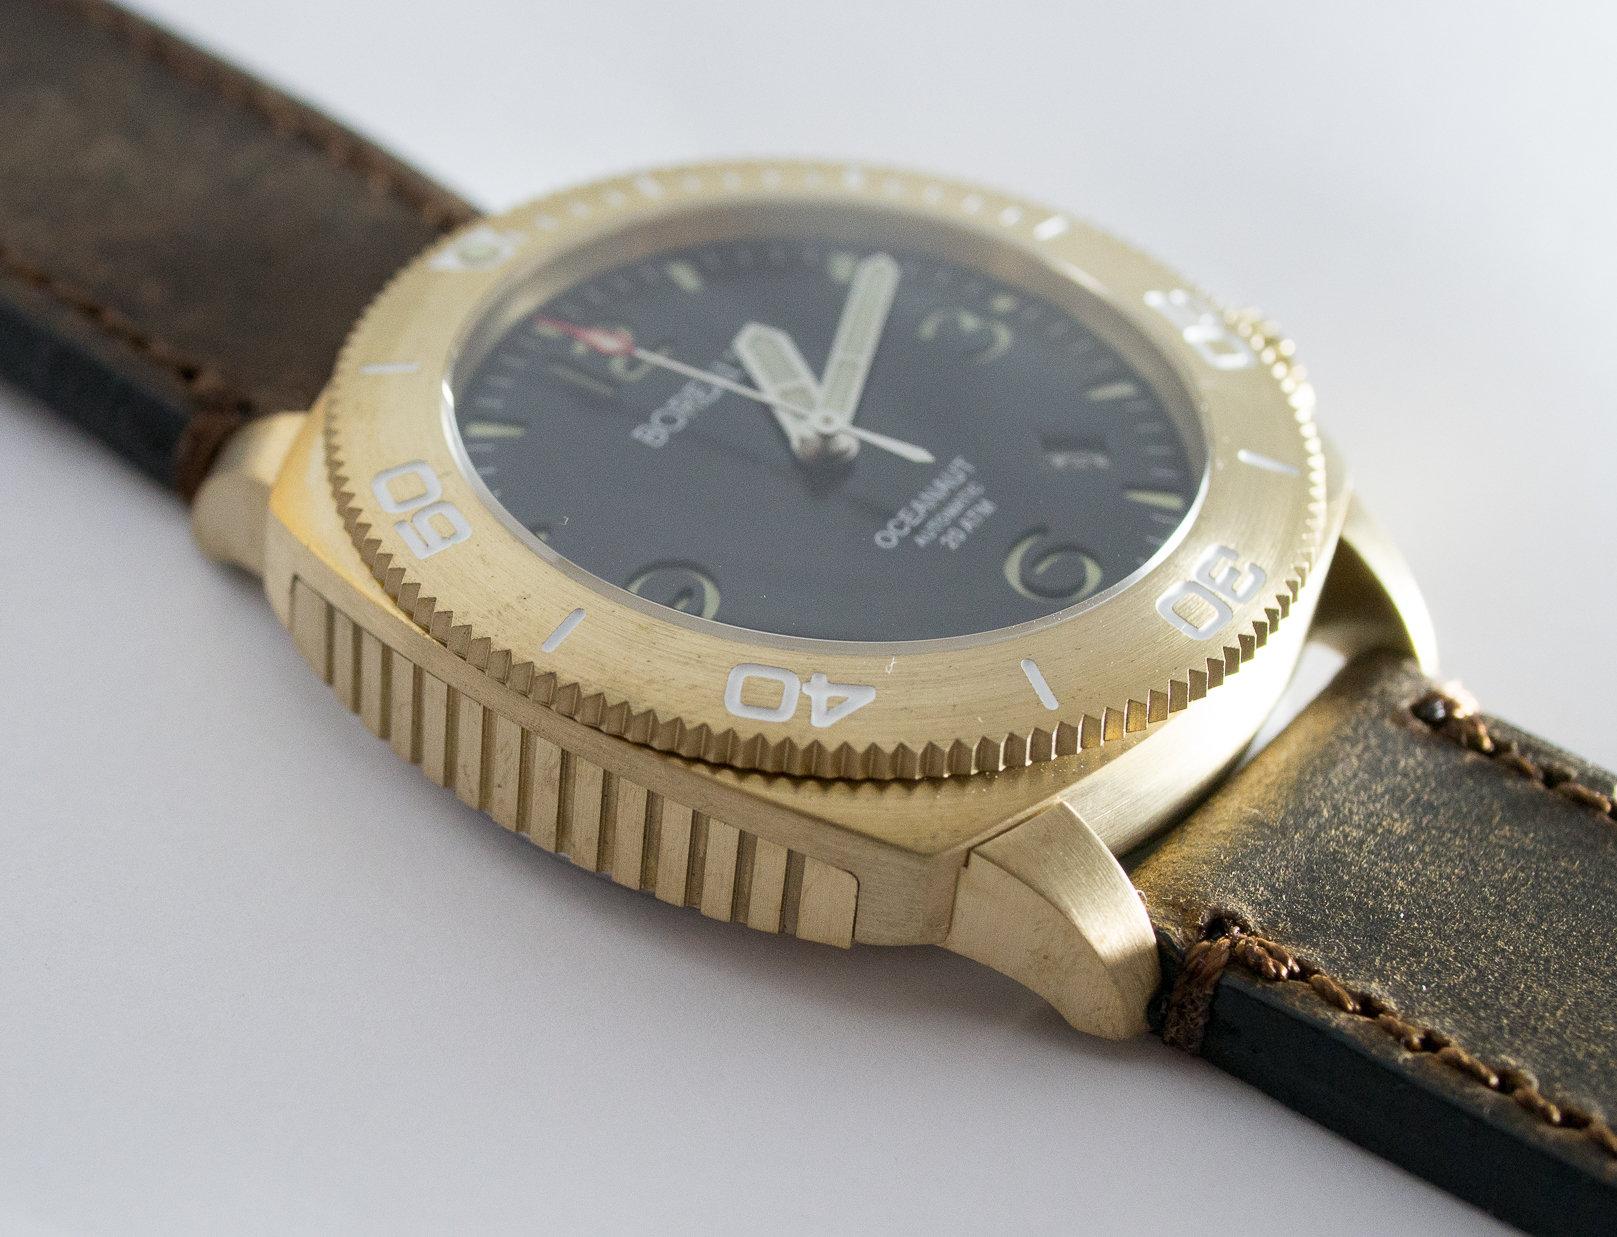 Borealis Oceanaut Aluminum Bronze Black Date 200m NH35 Automatic Diver Watch